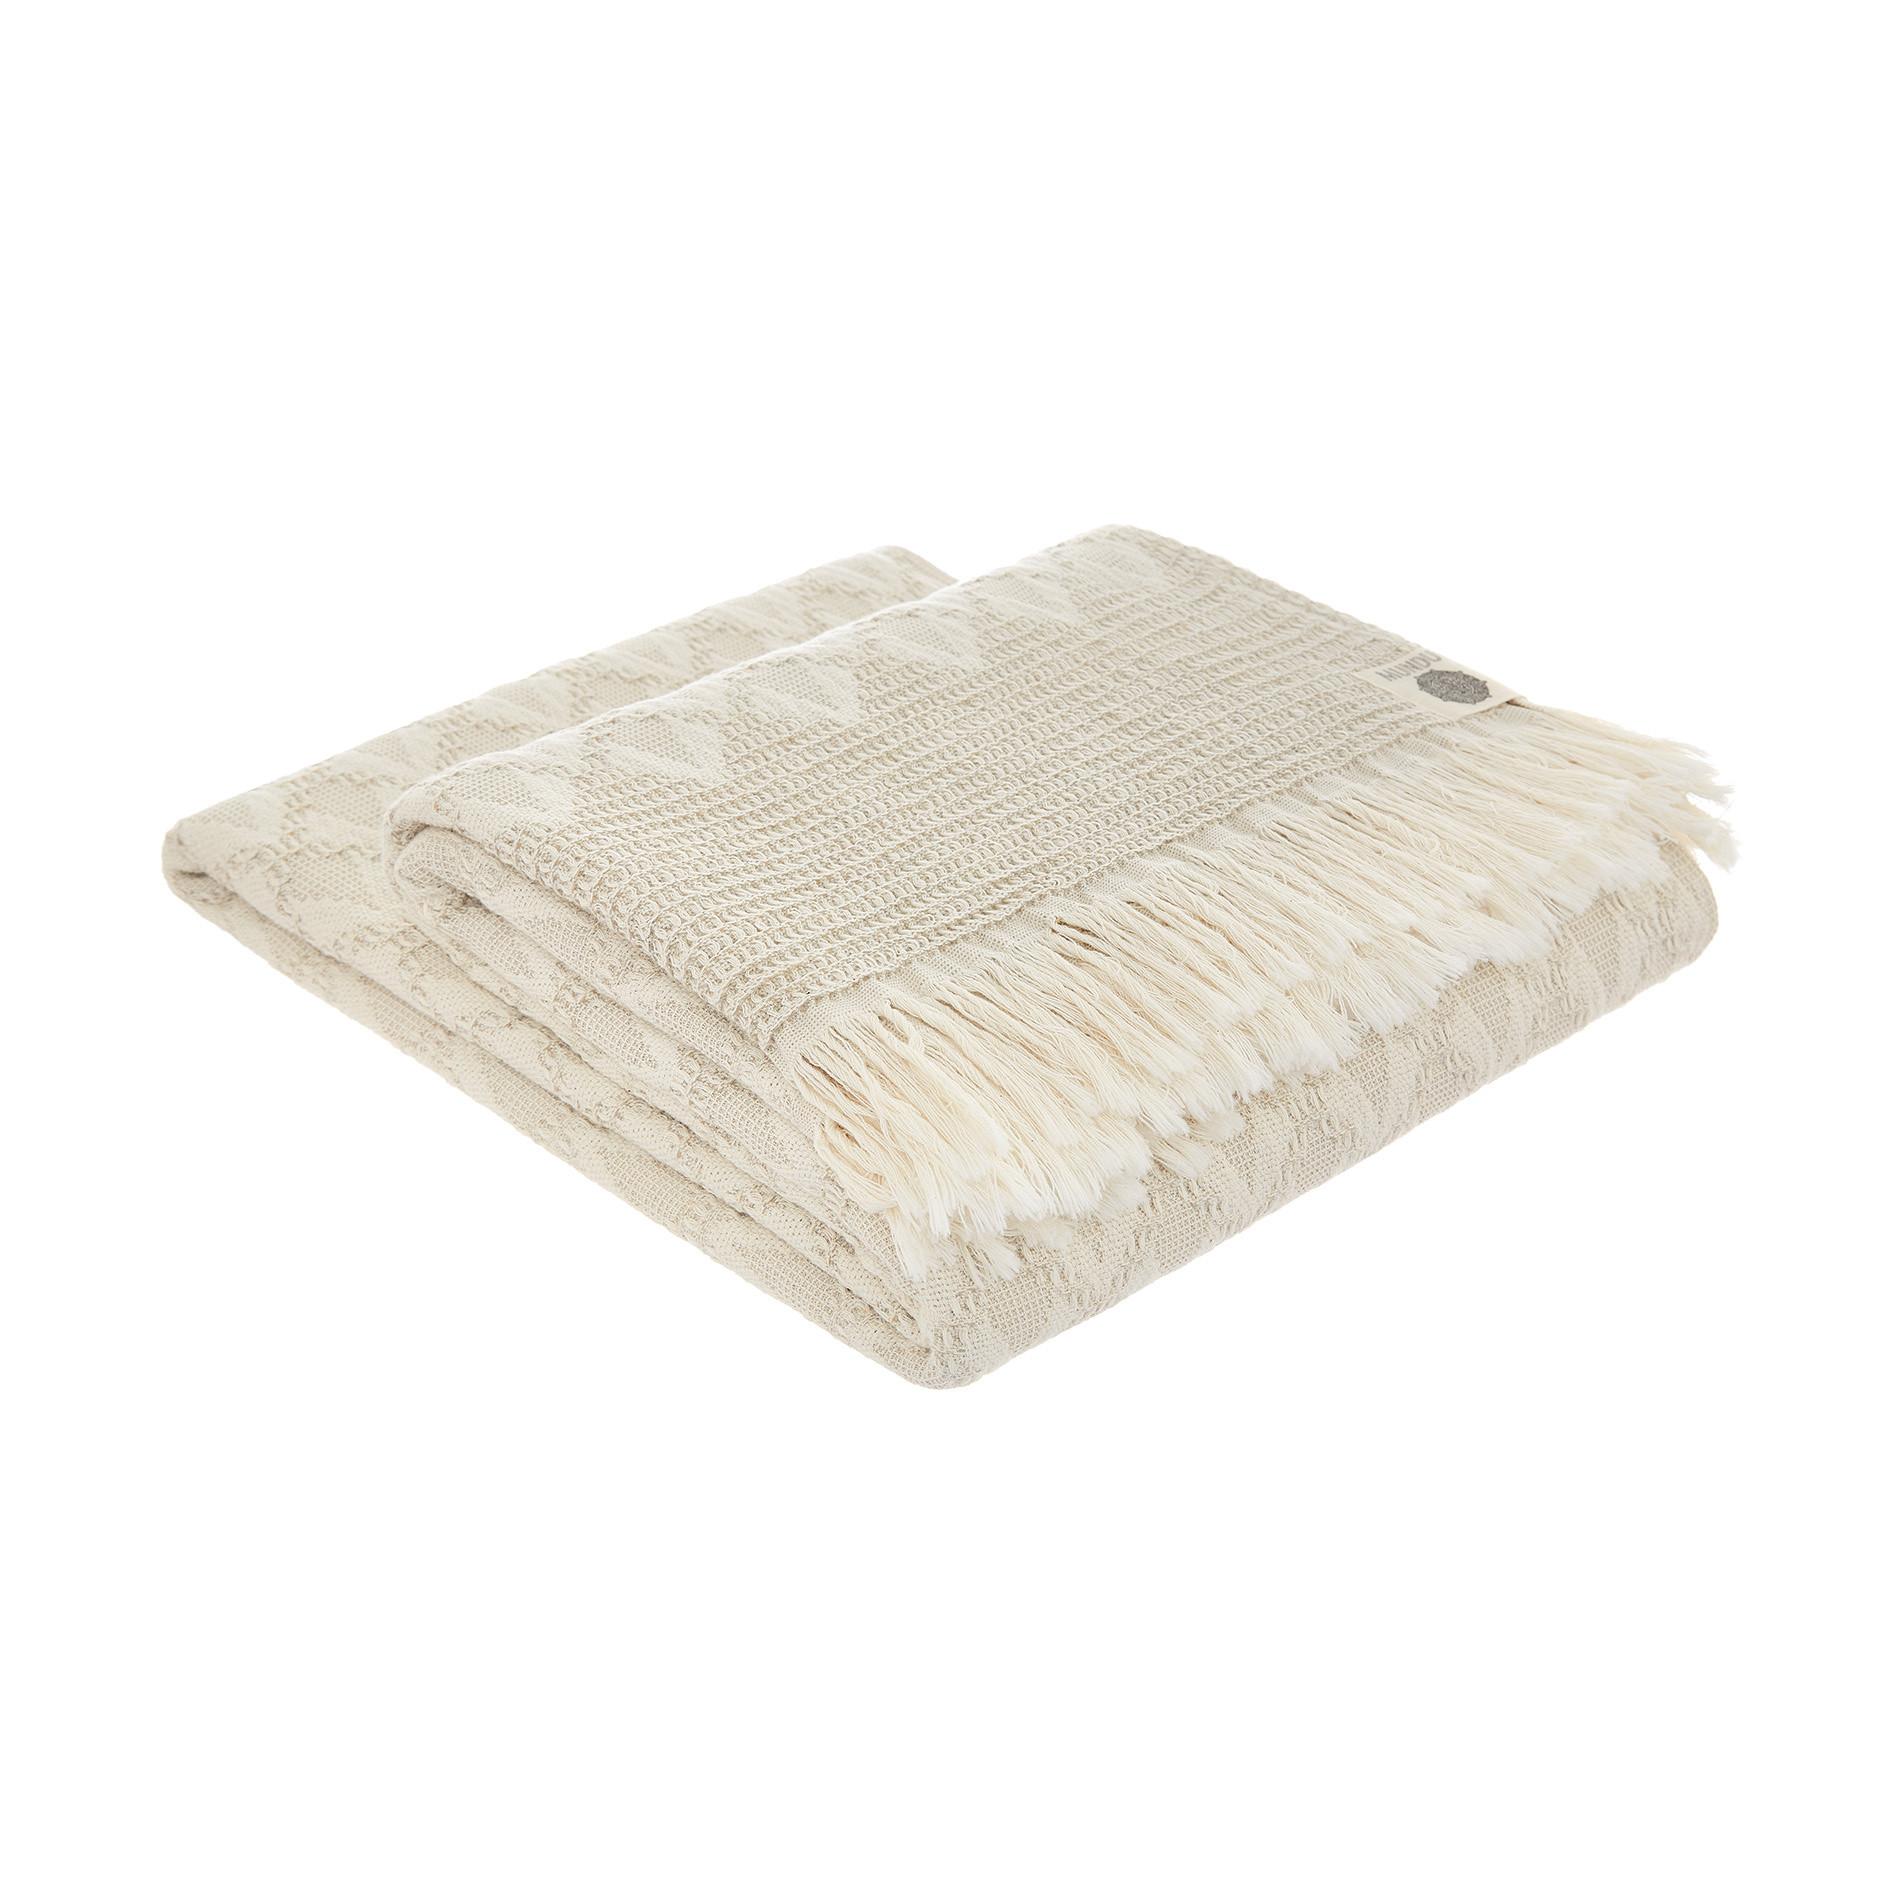 Plaid misto lino e cotone a rombi, Beige chiaro, large image number 0